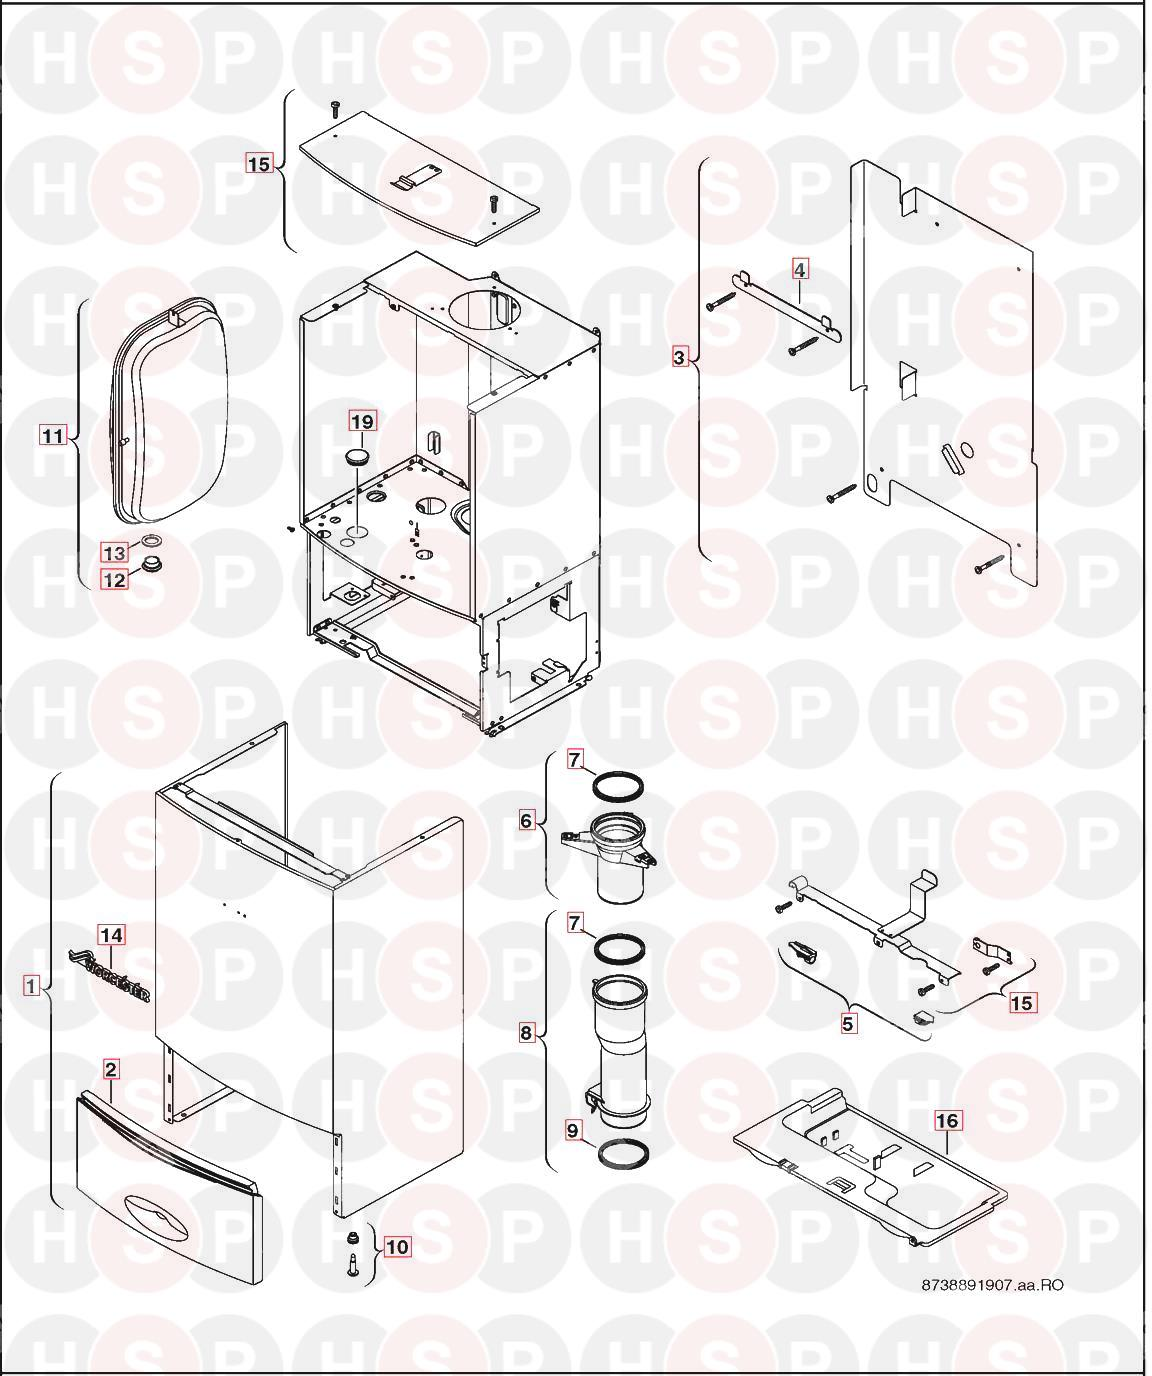 worcester greenstar 38cdi classic appliance diagram  sheet metal